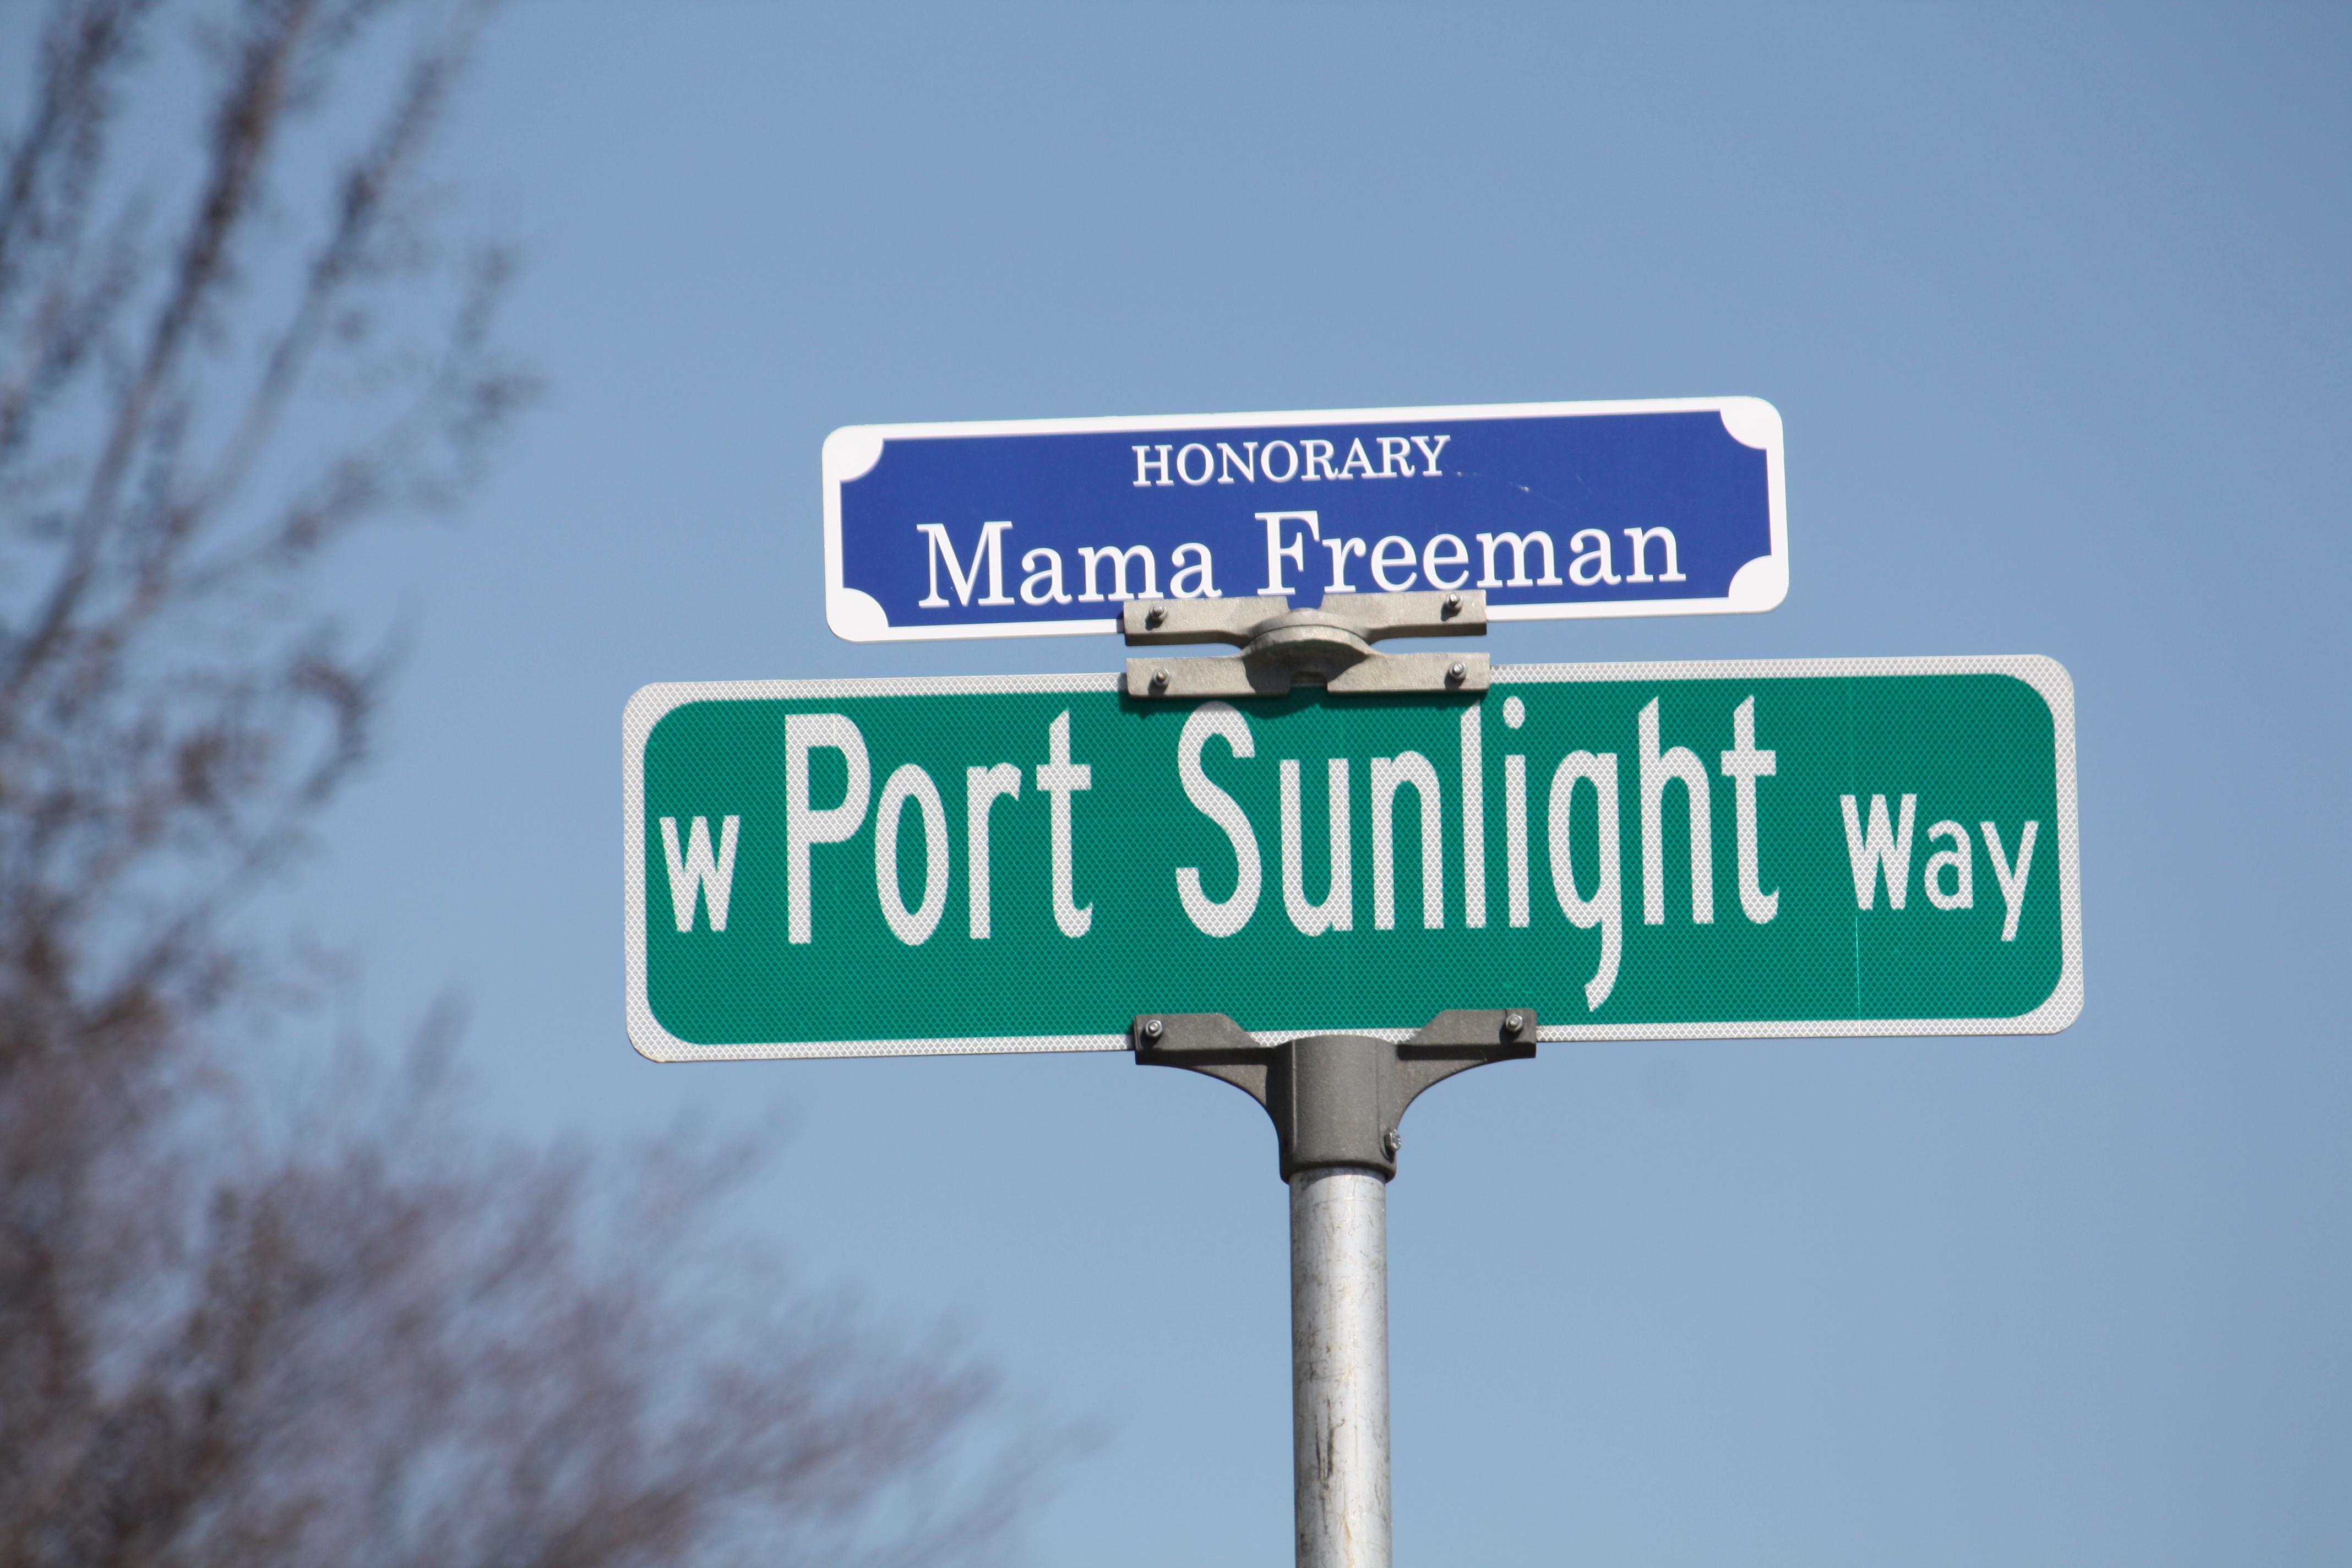 Mama Freeman honorary street sign. Photo by Carl Baehr.